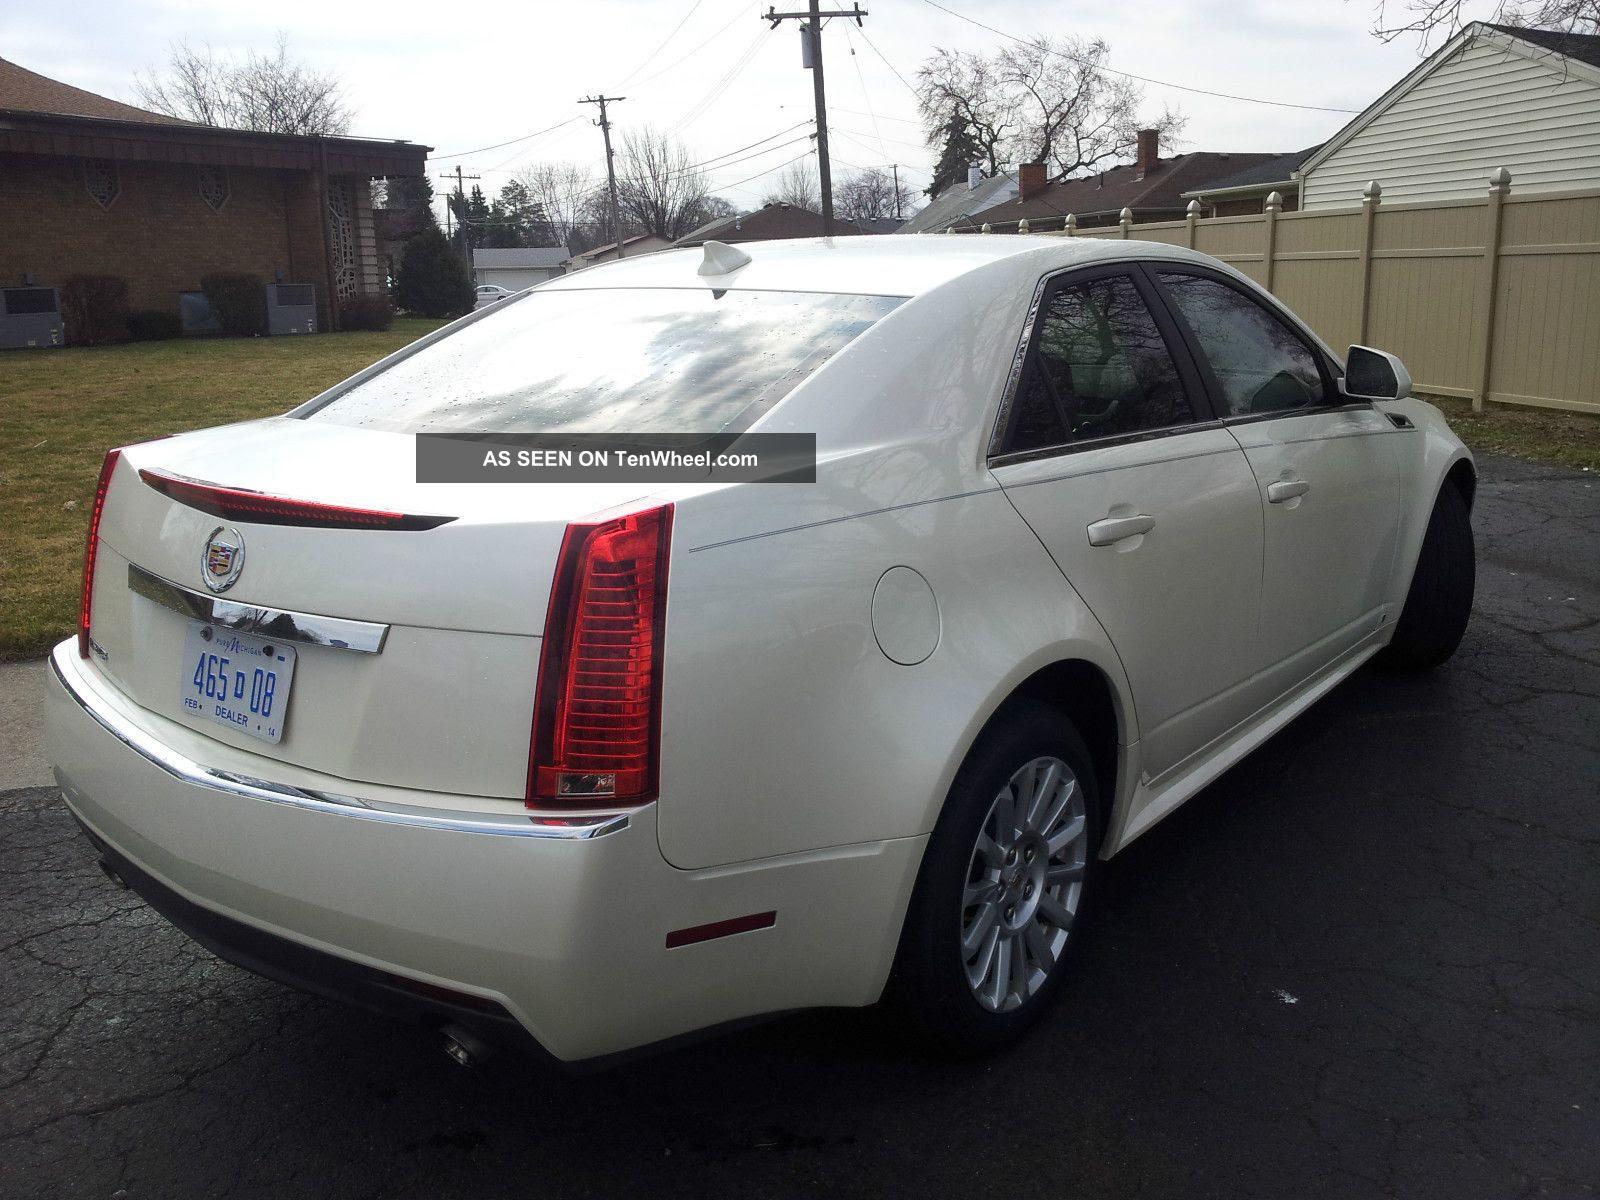 2010 Cadillac Cts Luxury Sedan 4 - Door 3. 0l